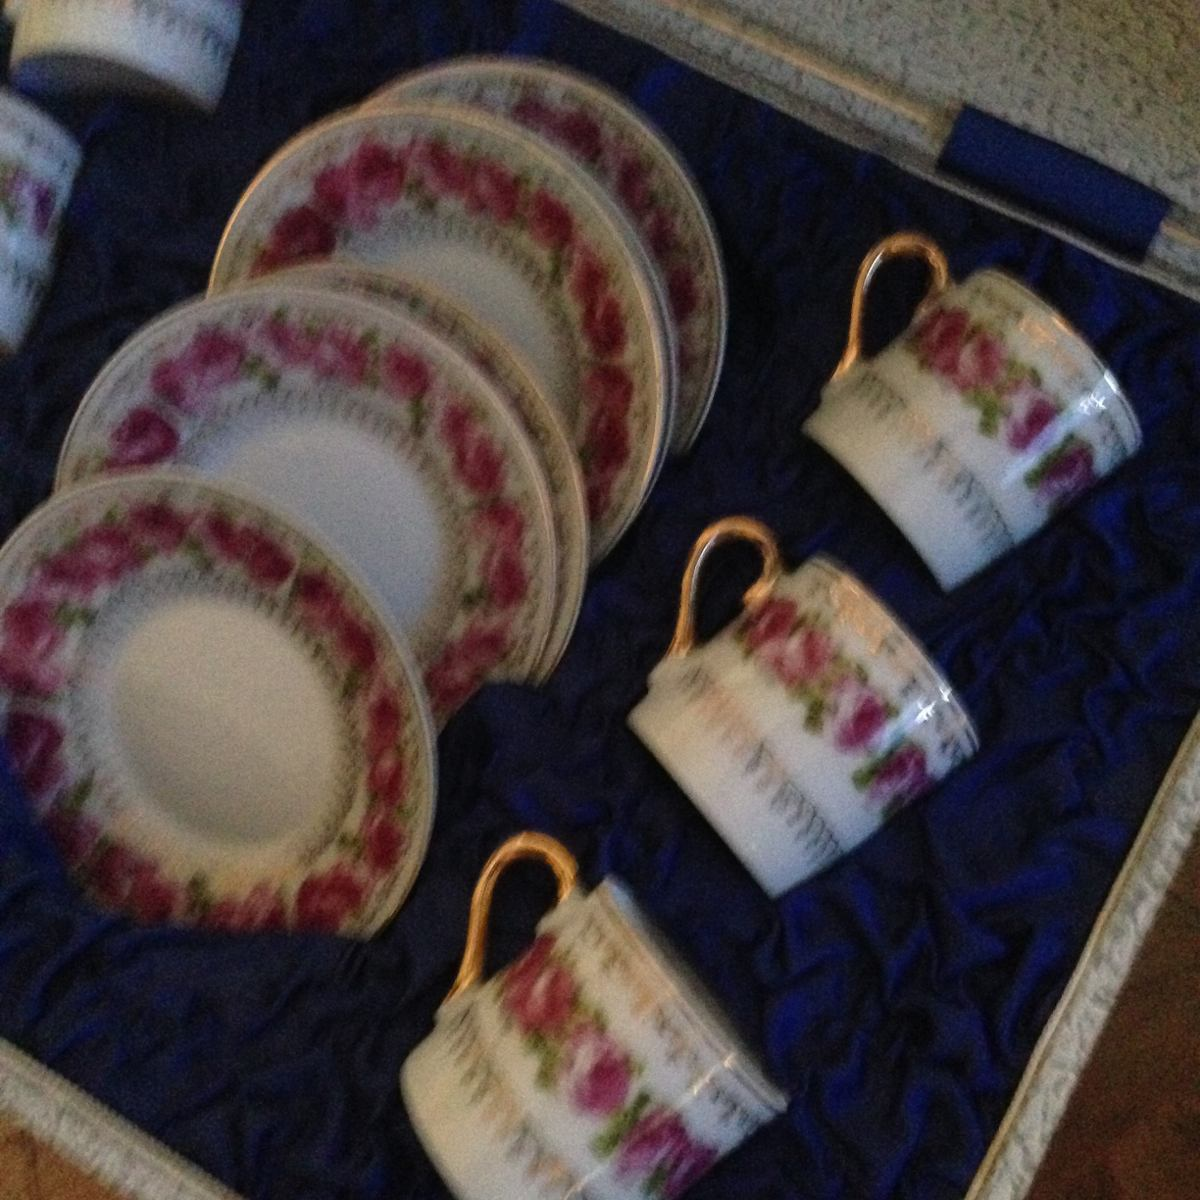 Juego tazas de t porcelana en mercado libre for Juego de tazas de te